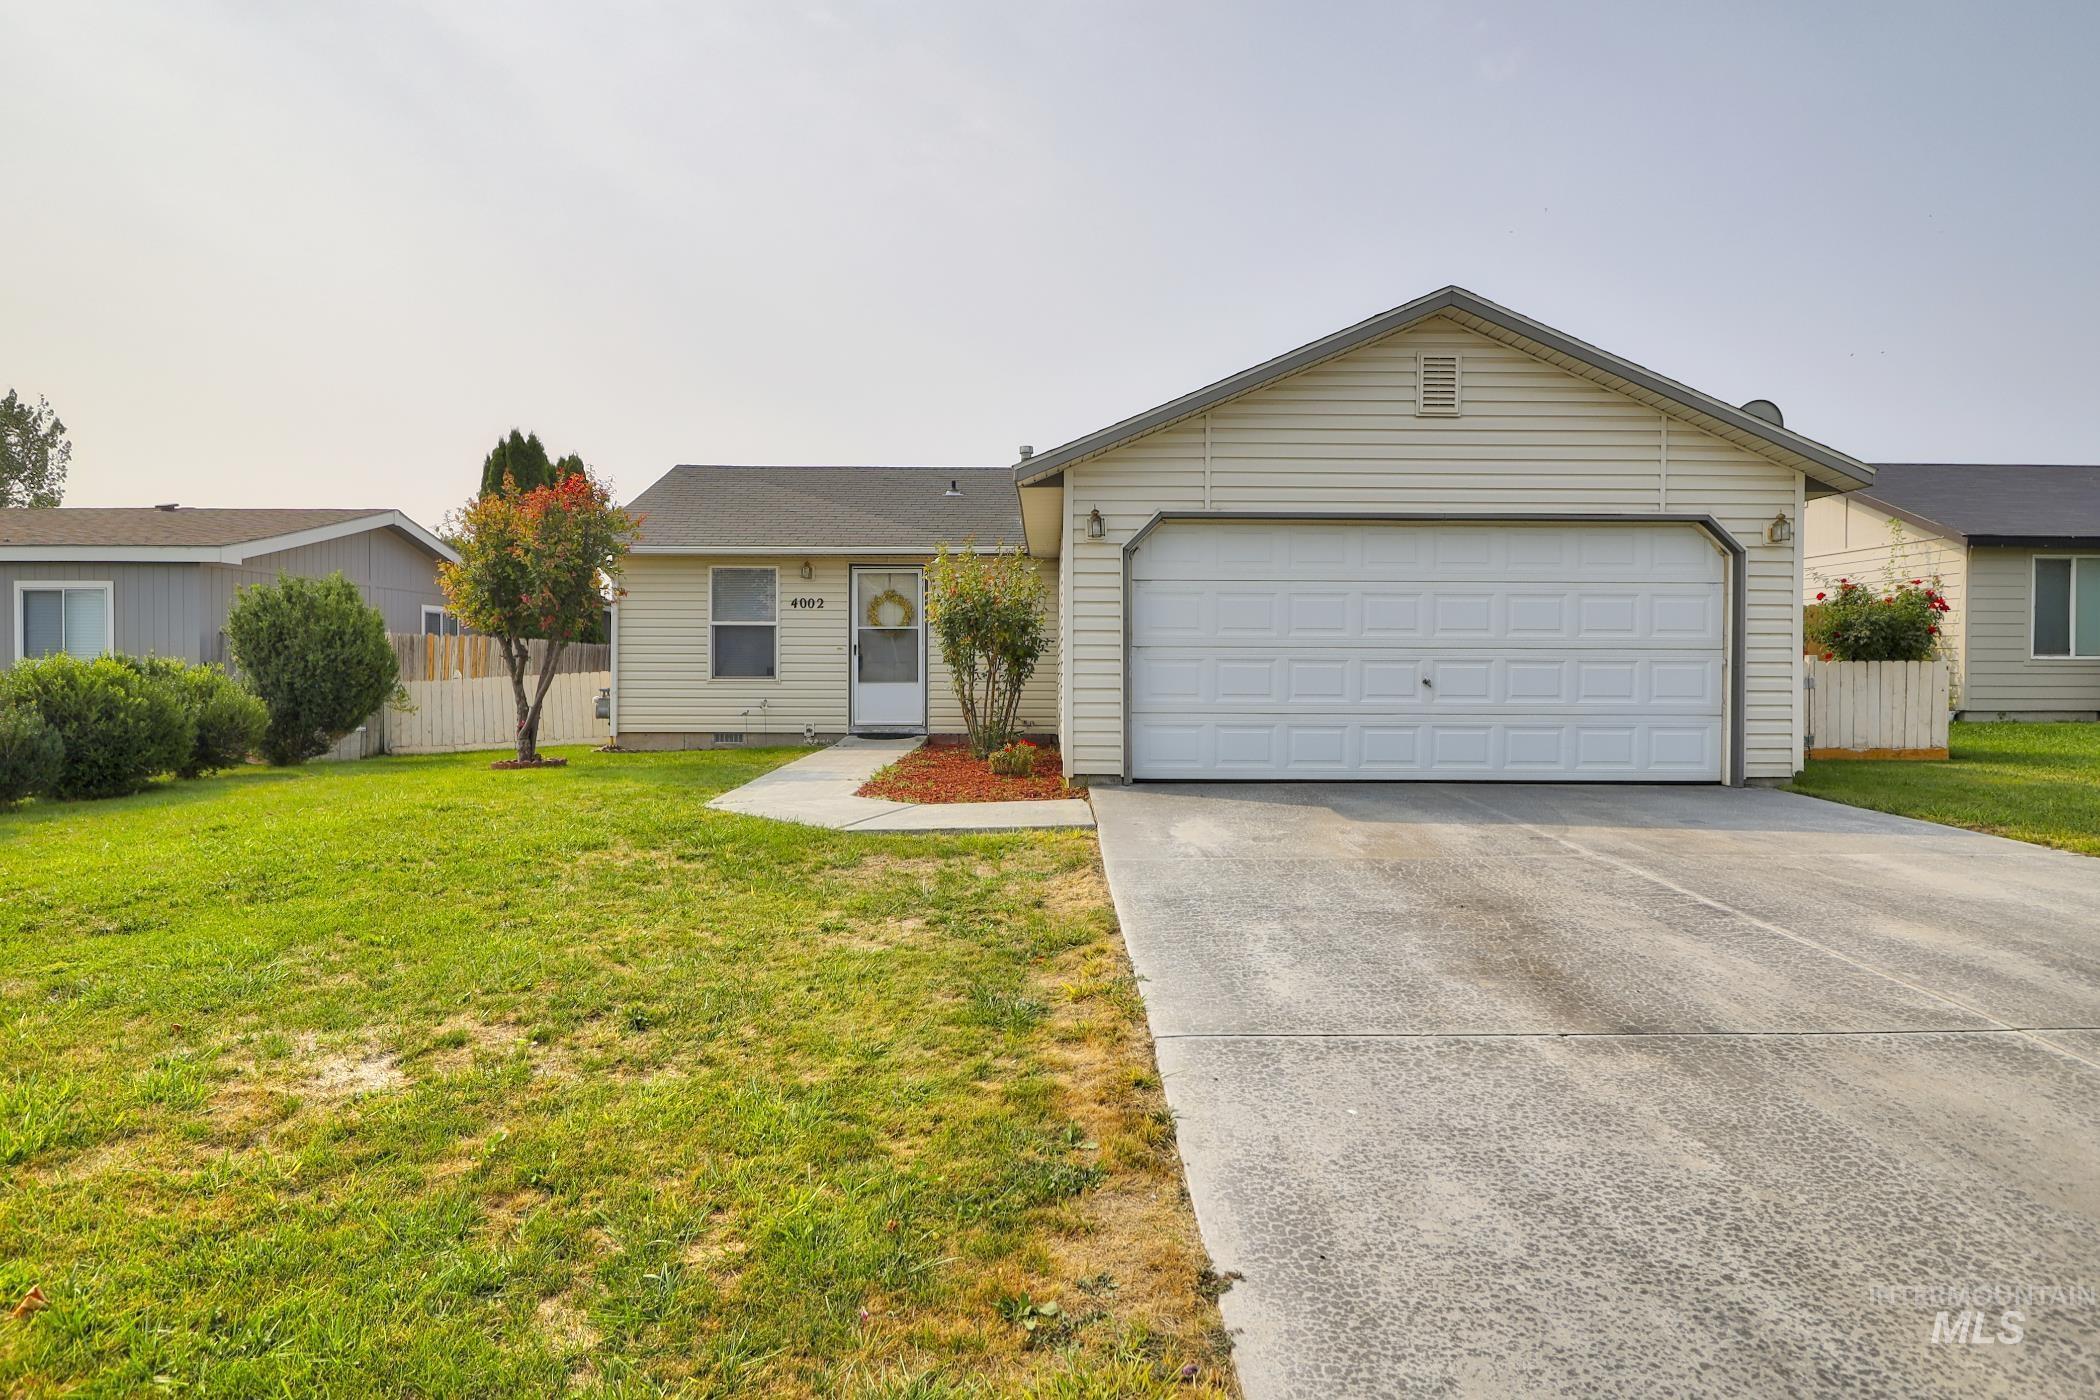 4002 S Clayton St Property Photo